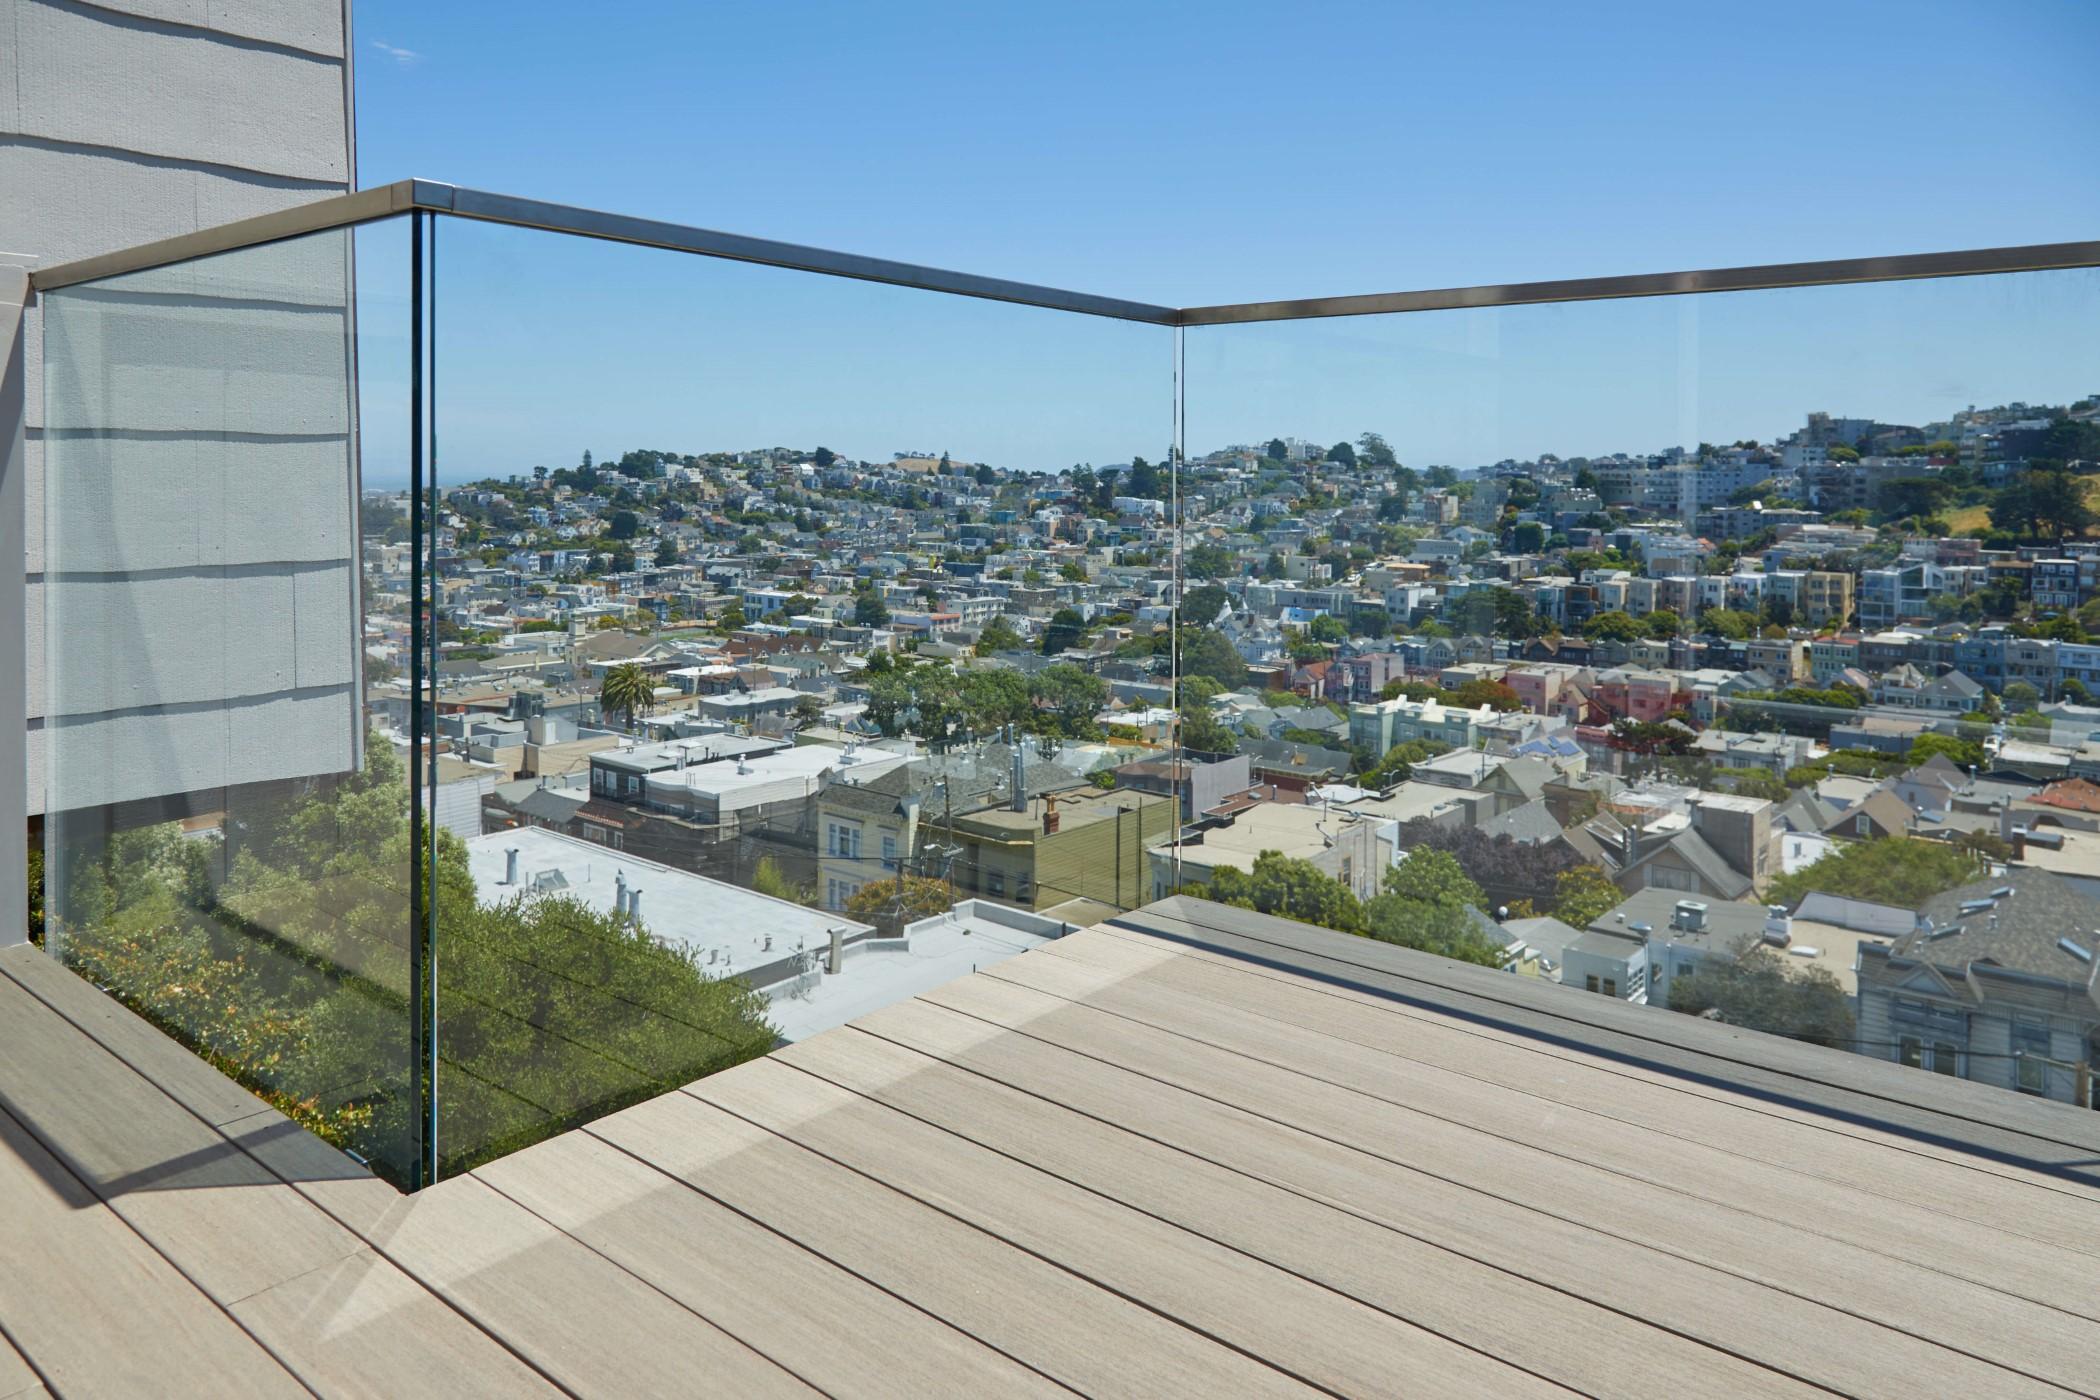 Glass Railing Glass Railing For Stairs Decks Balconies